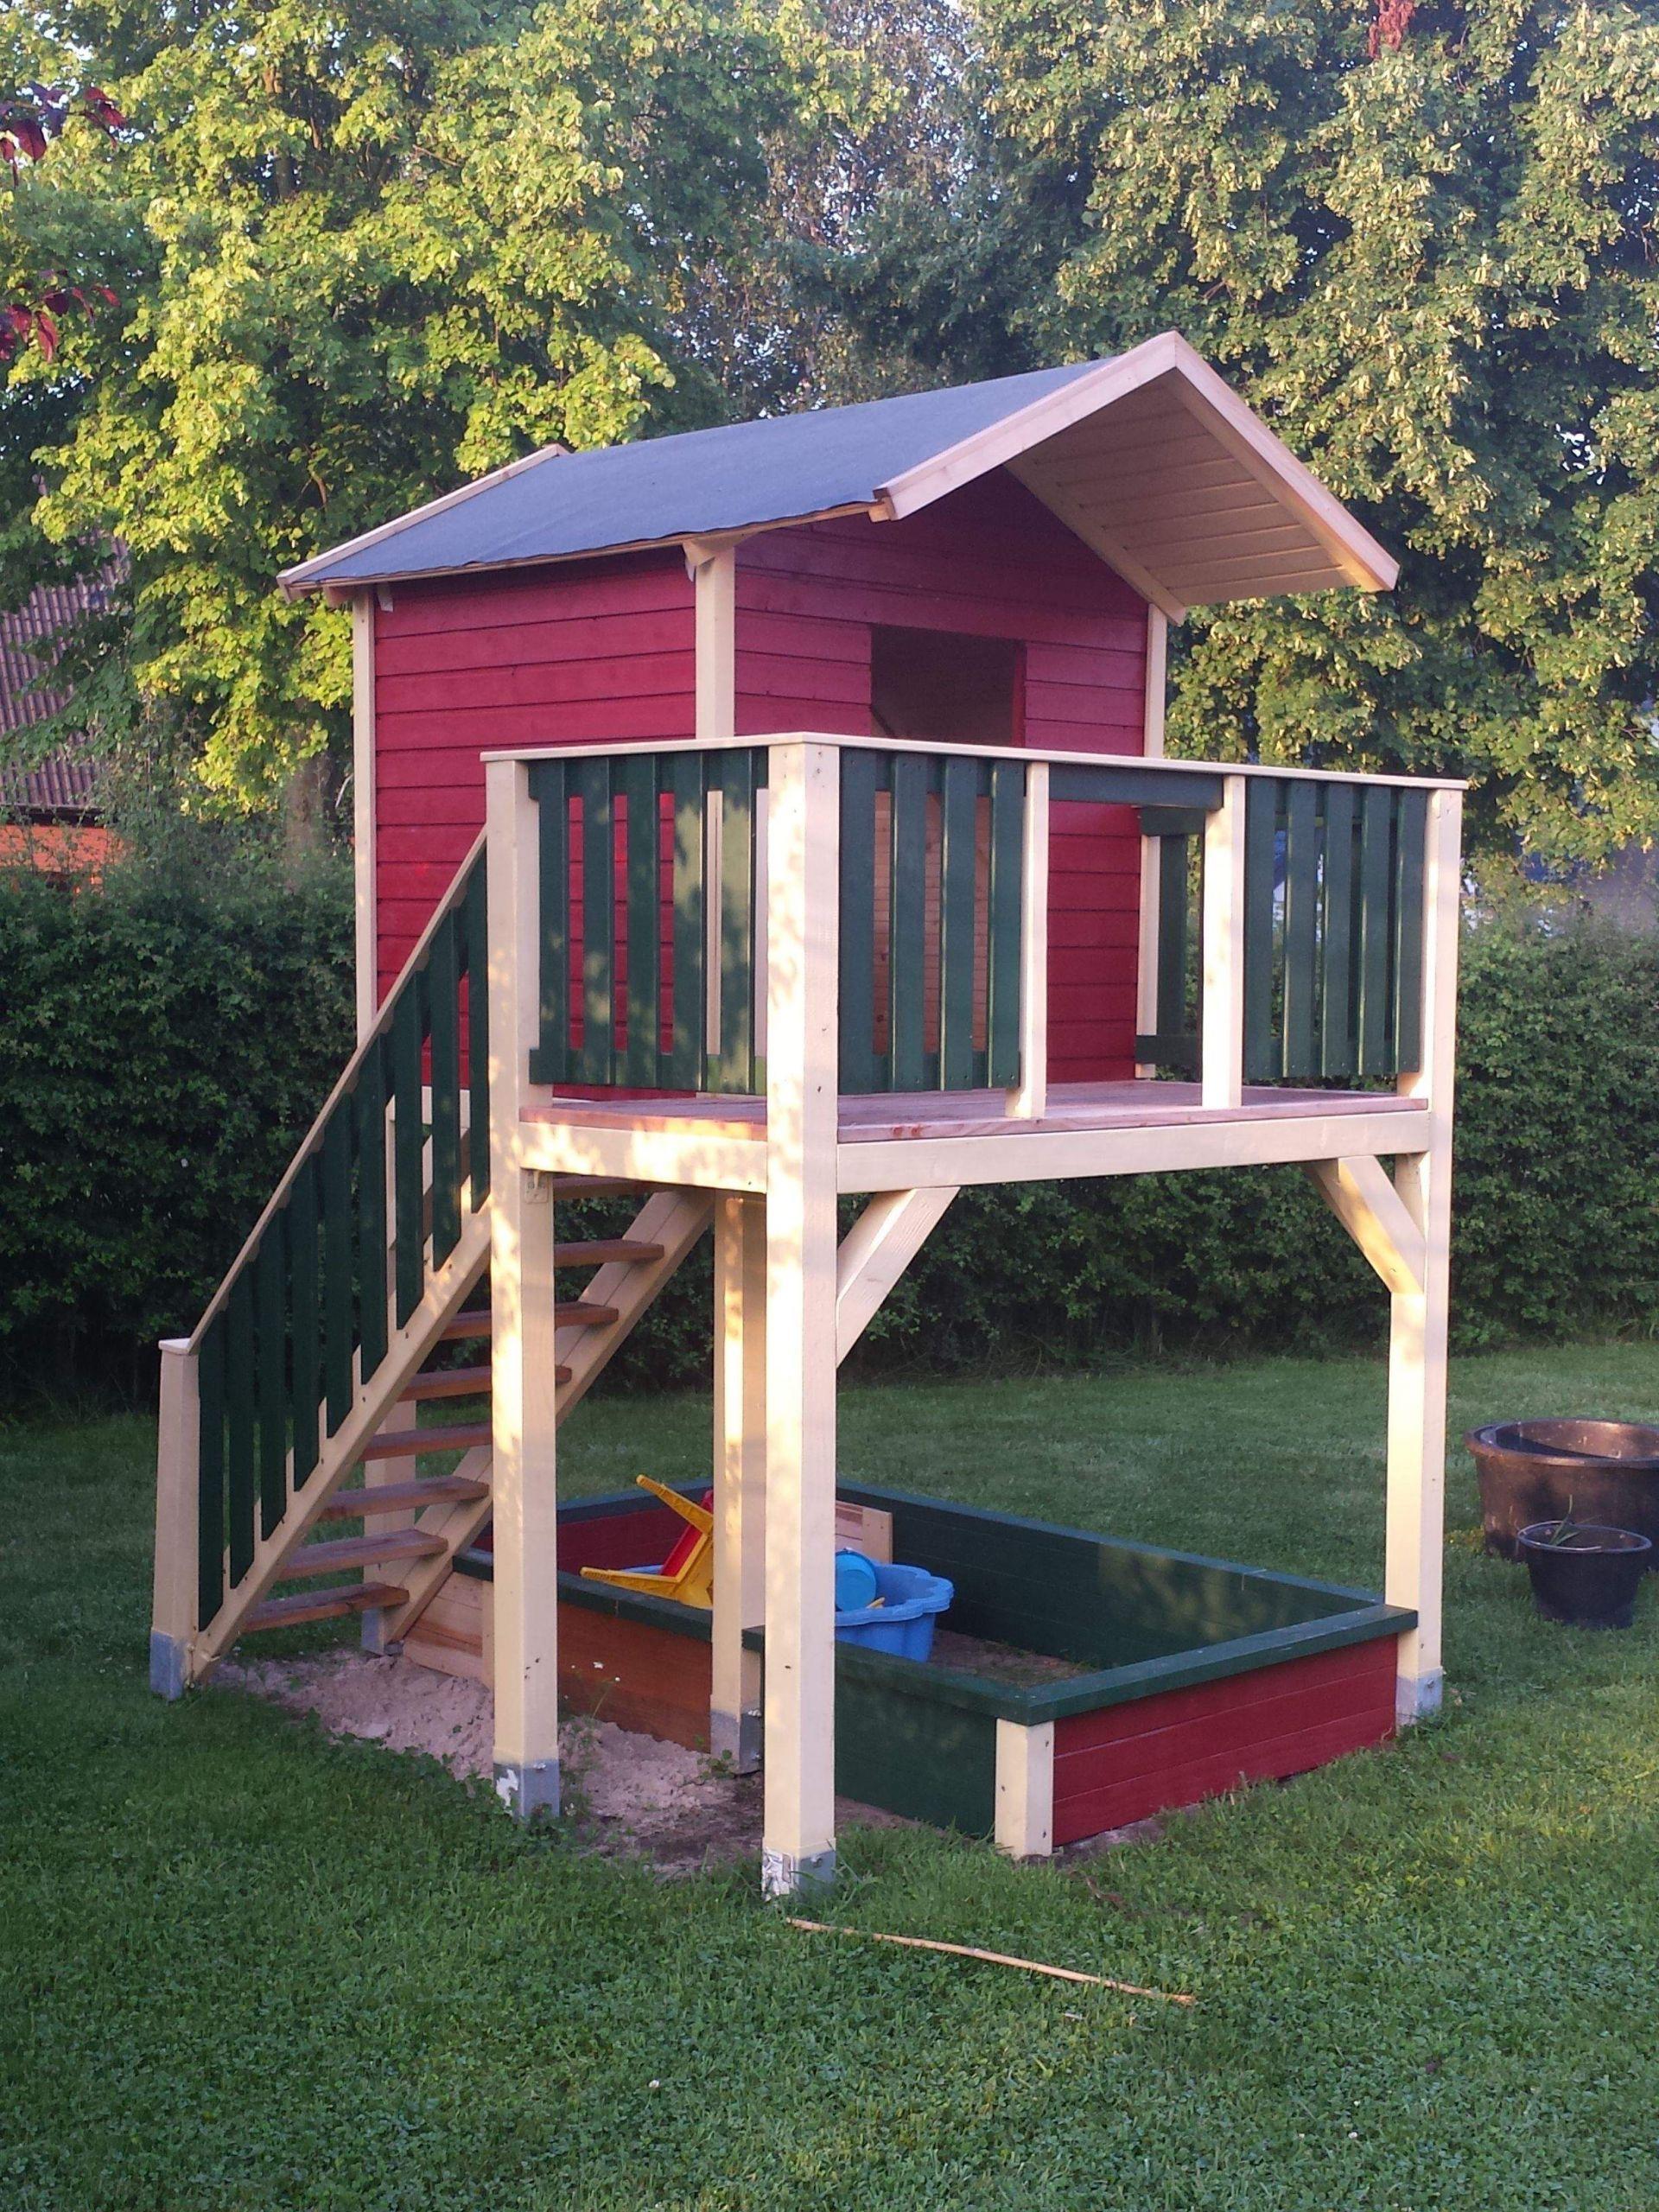 Kinderhaus Garten Neu Spielturm Mit Treppe Bauanleitung Zum Selber Bauen